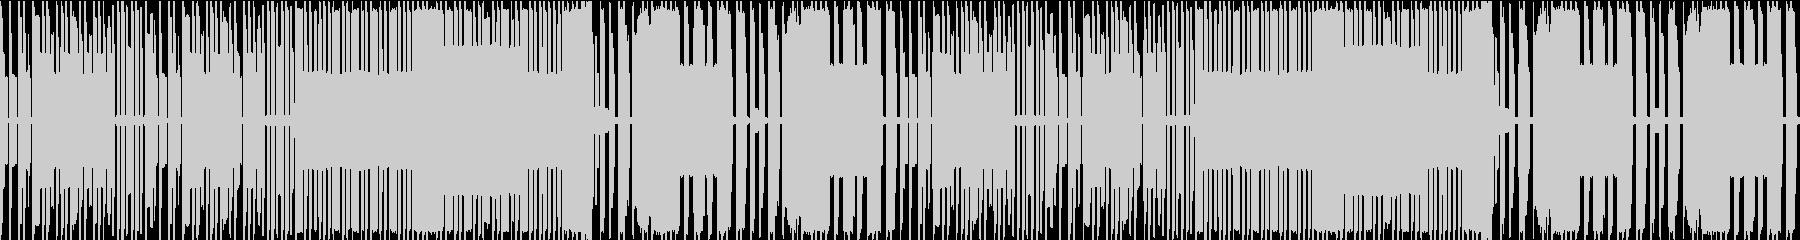 FC風ループ オートドライバーの未再生の波形